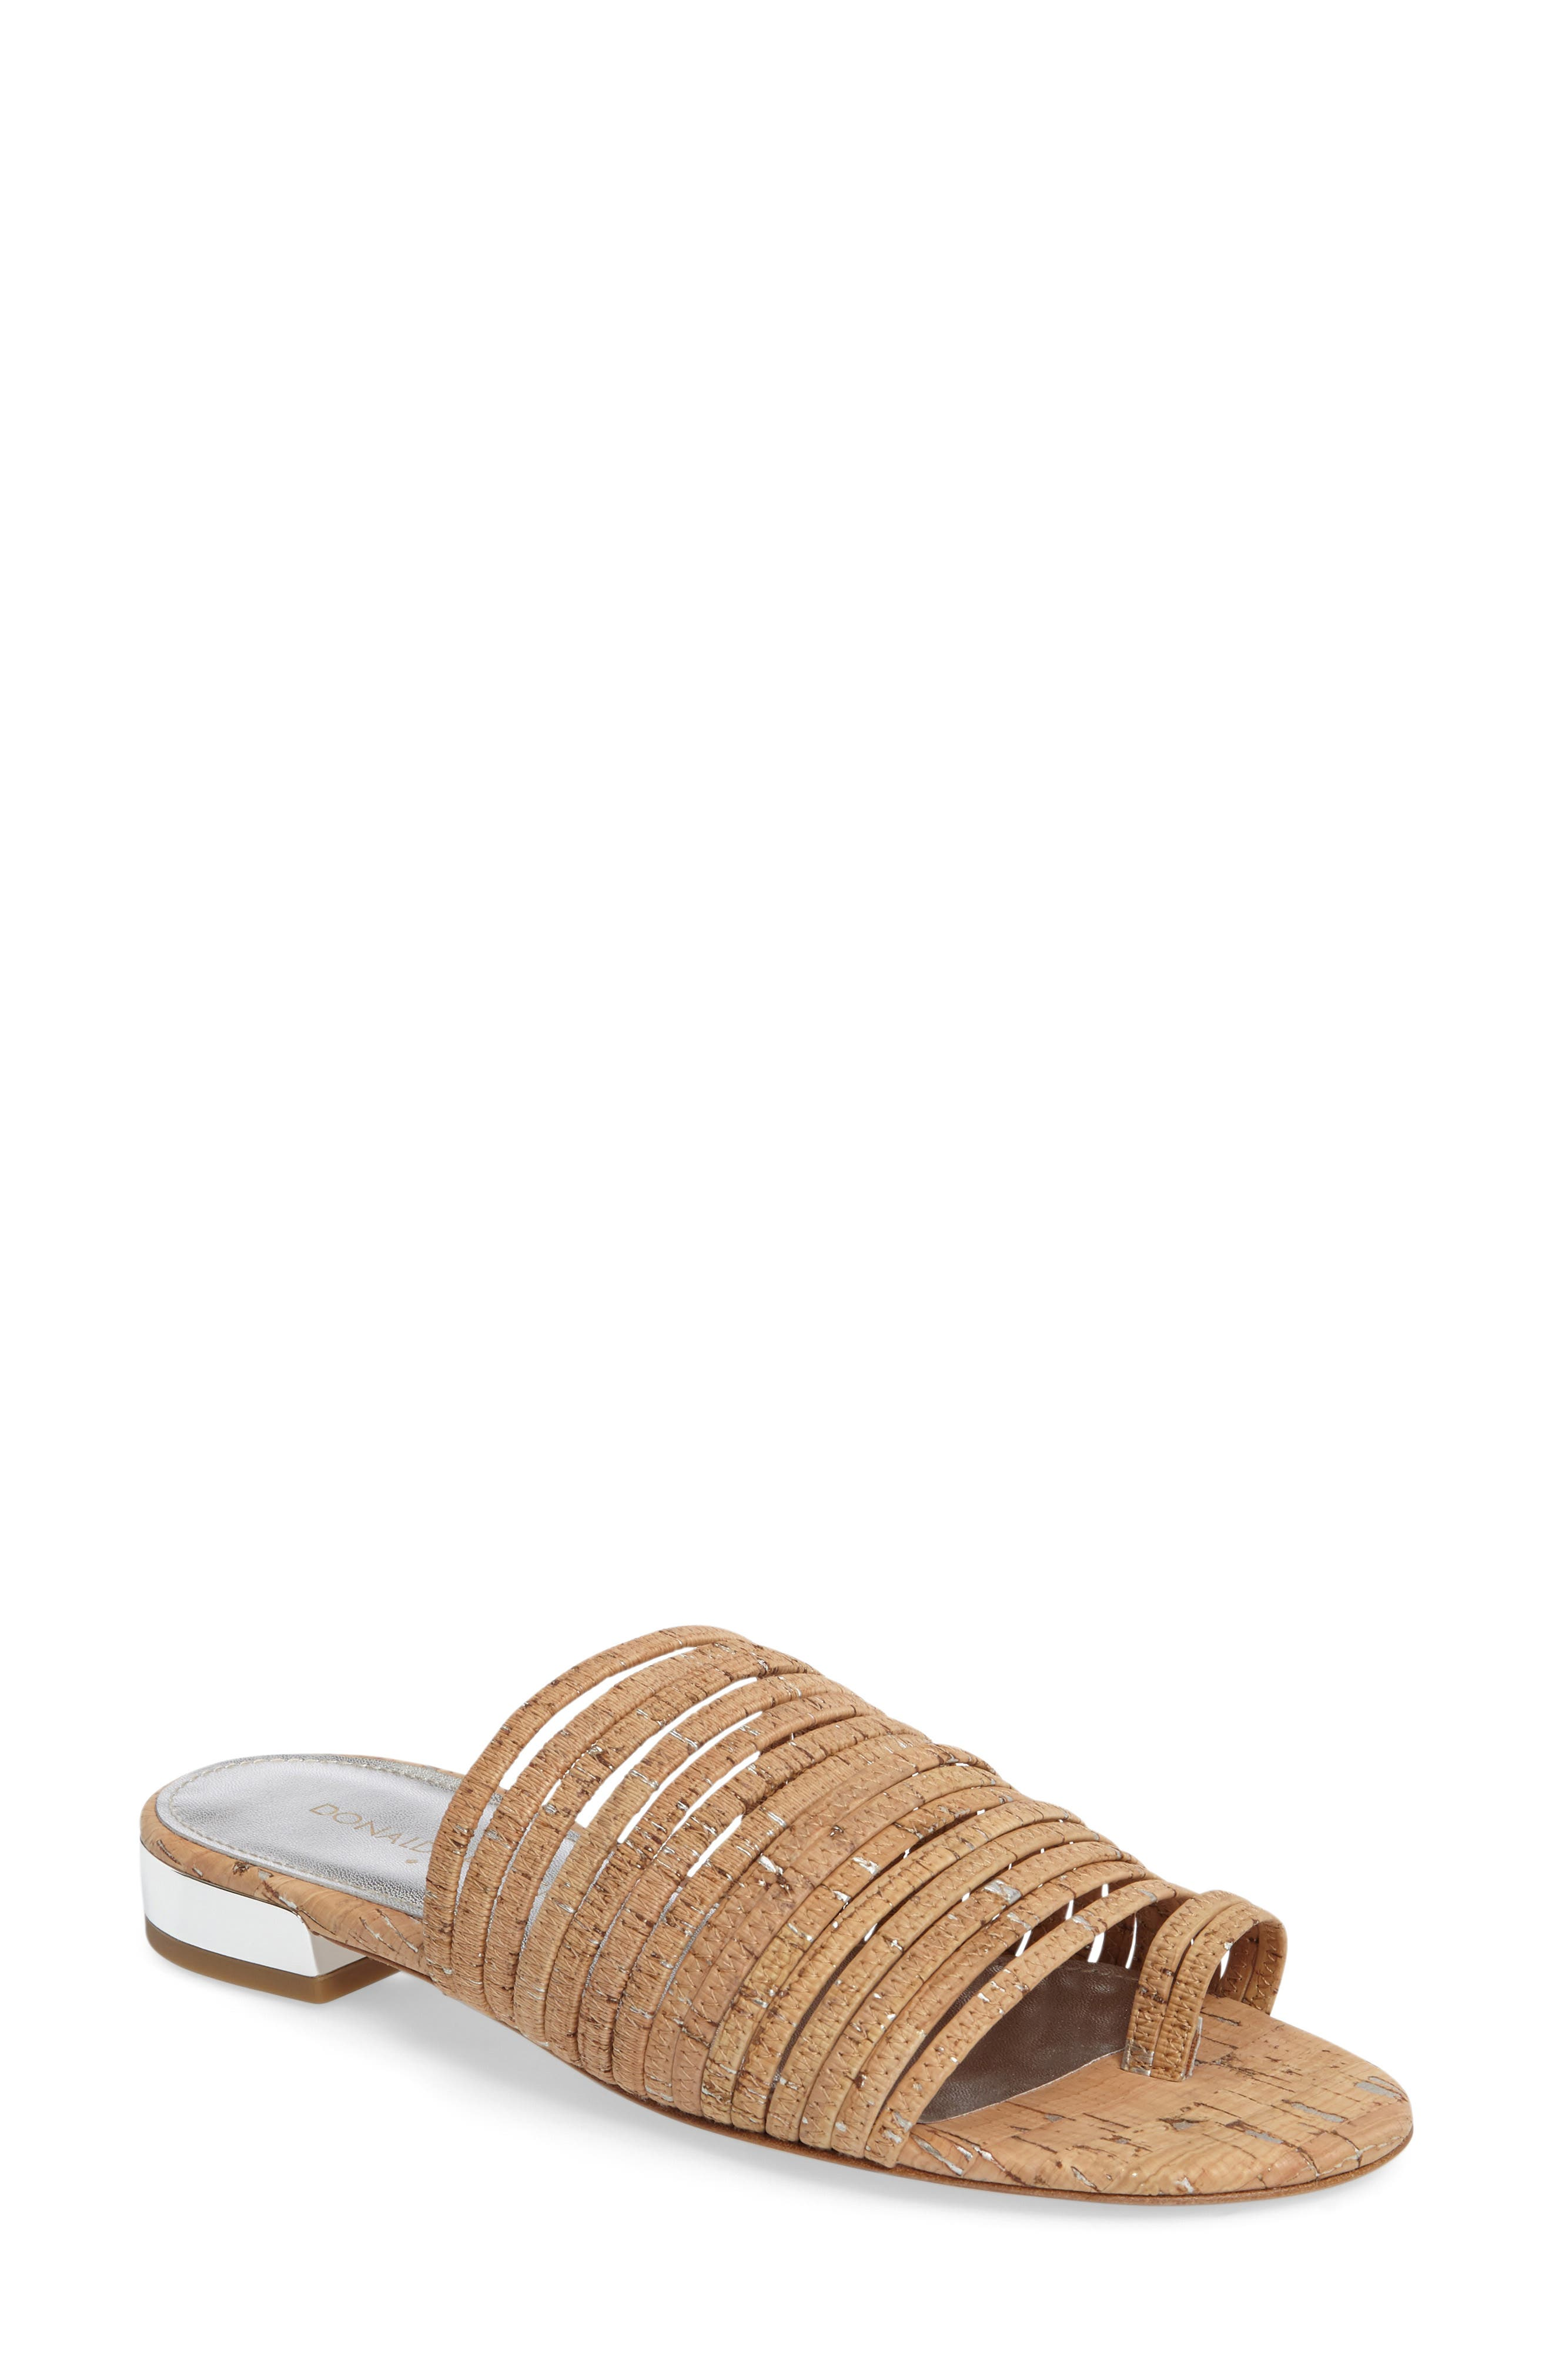 Frea Strappy Sandal,                             Main thumbnail 1, color,                             Natural Cork